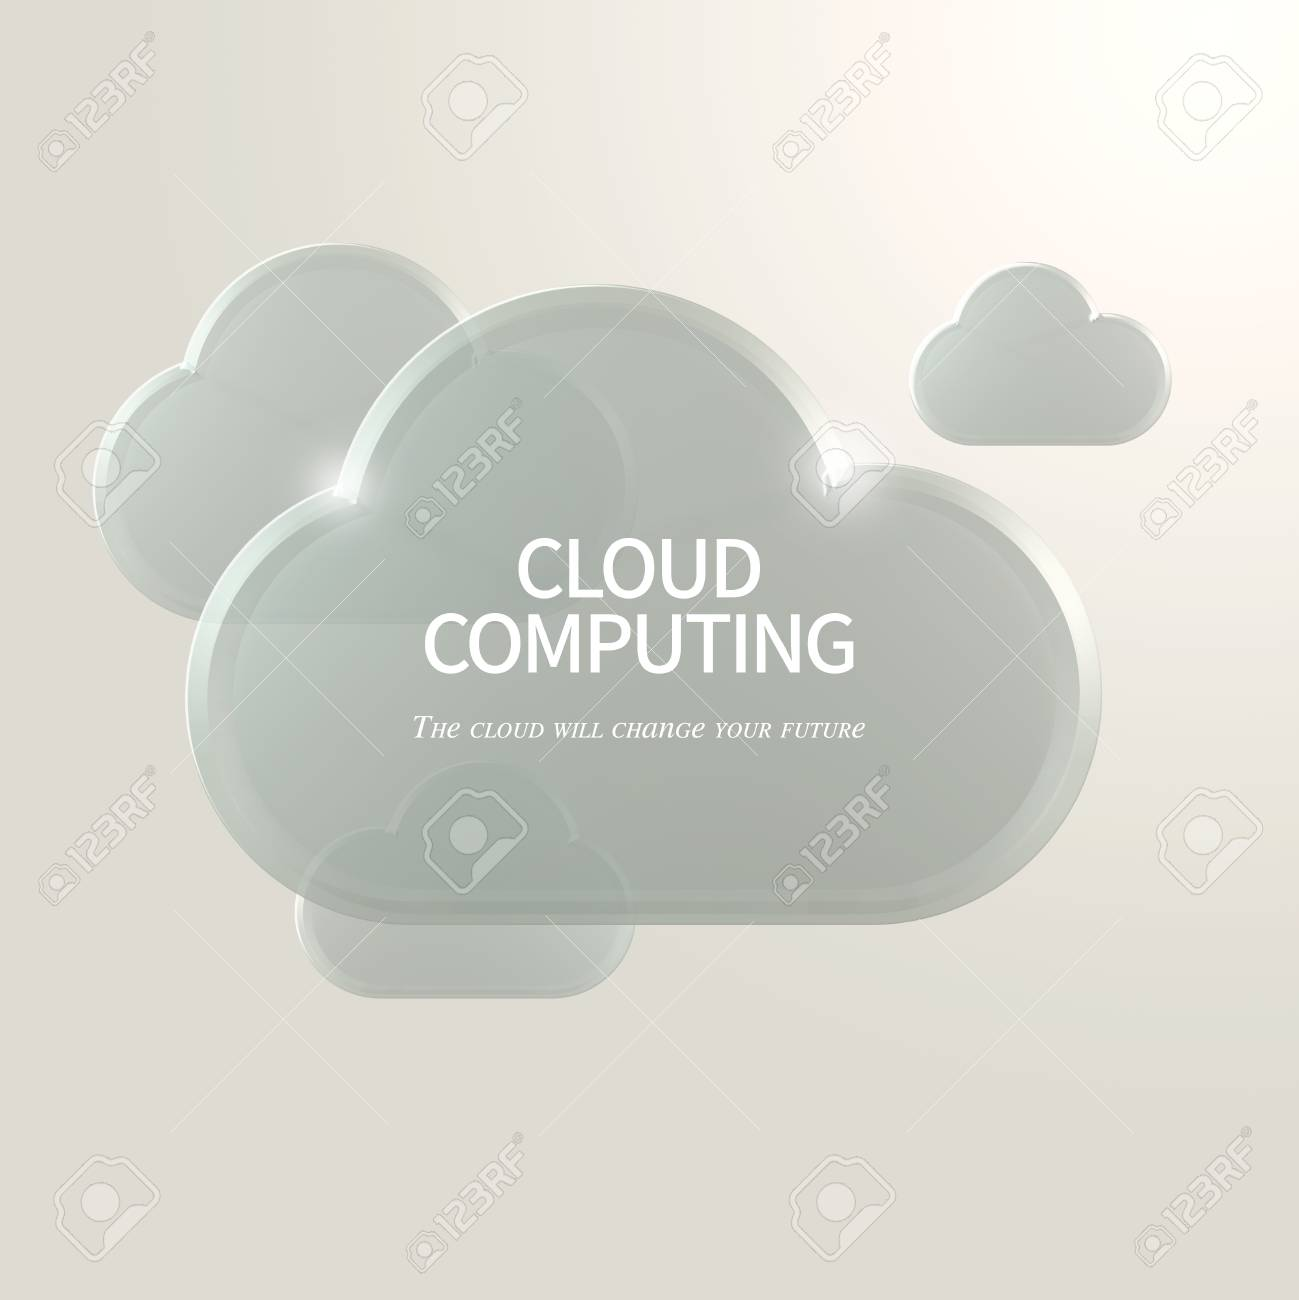 Cloud Computing Concept Virtual Cloud Symbol Over White